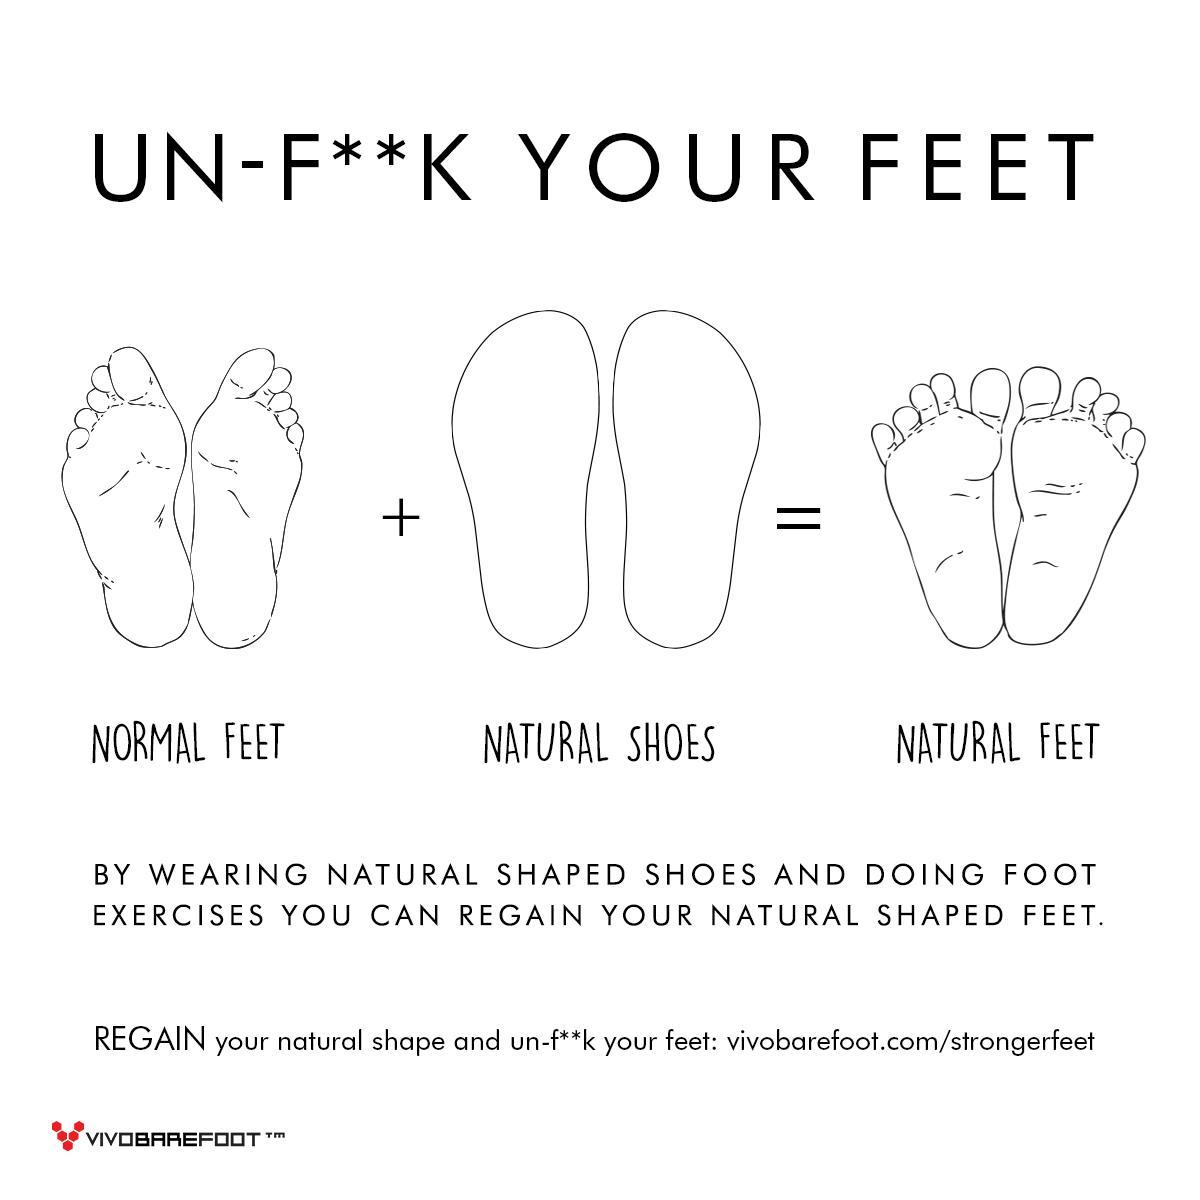 It's time to un-fuck your feet. http://t.co/5NA0e0X4Tn #ForFootSake http://t.co/WXkoaZm3ml